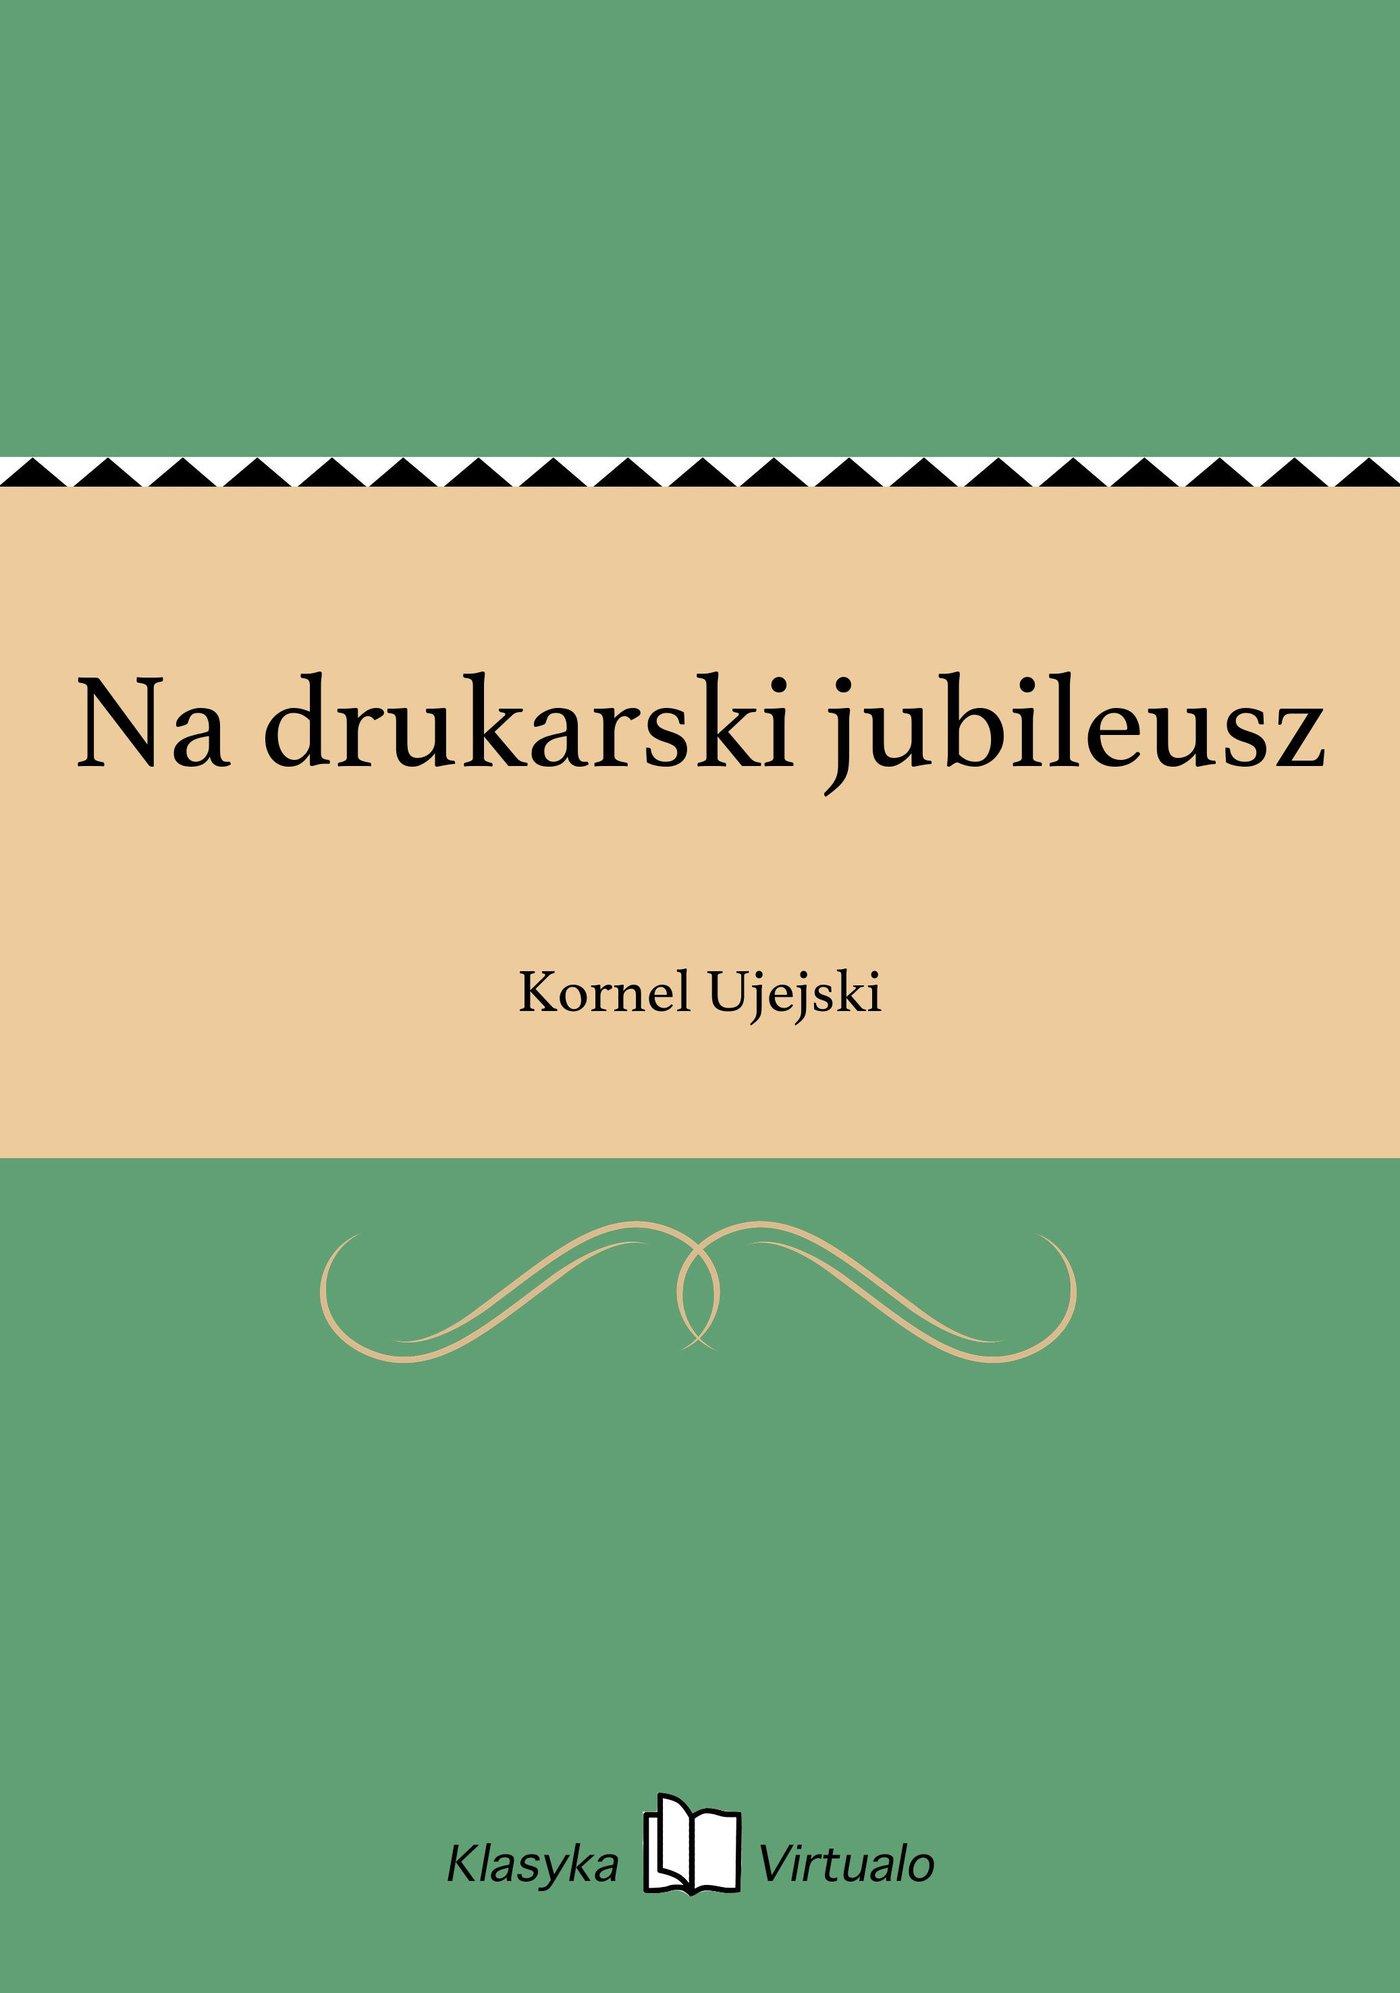 Na drukarski jubileusz - Ebook (Książka na Kindle) do pobrania w formacie MOBI